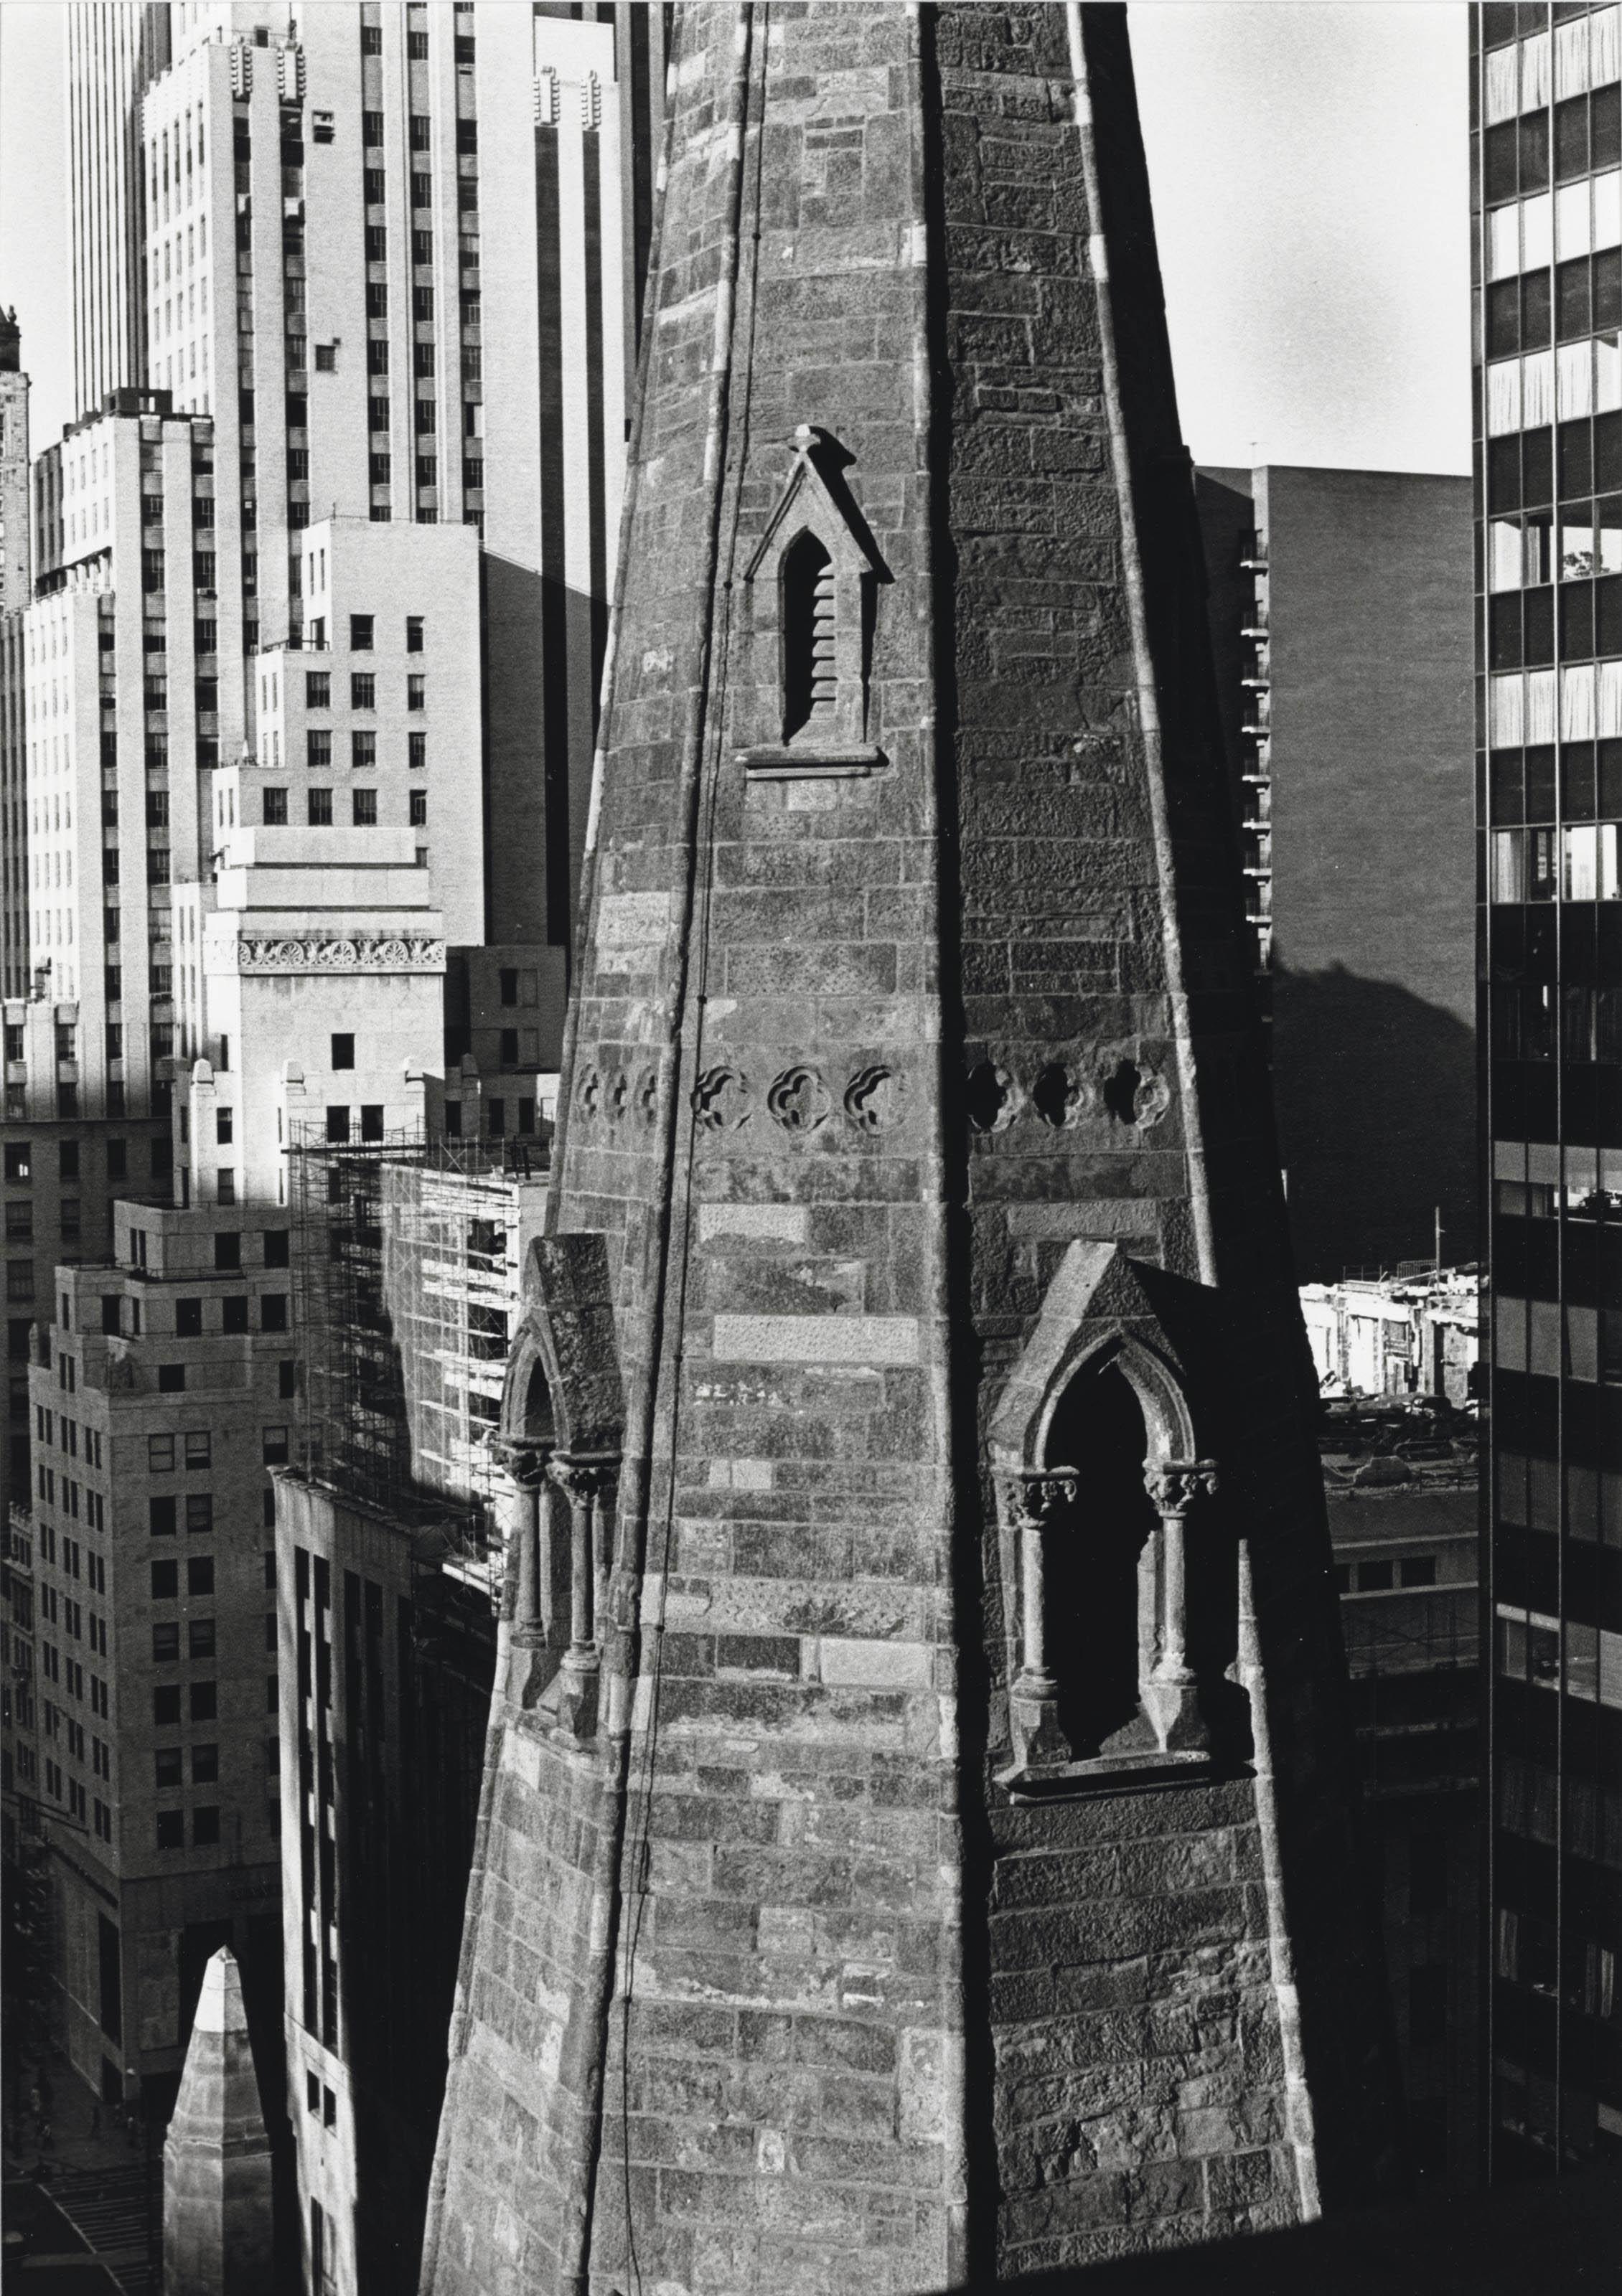 Fifth Avenue, New York, 1940